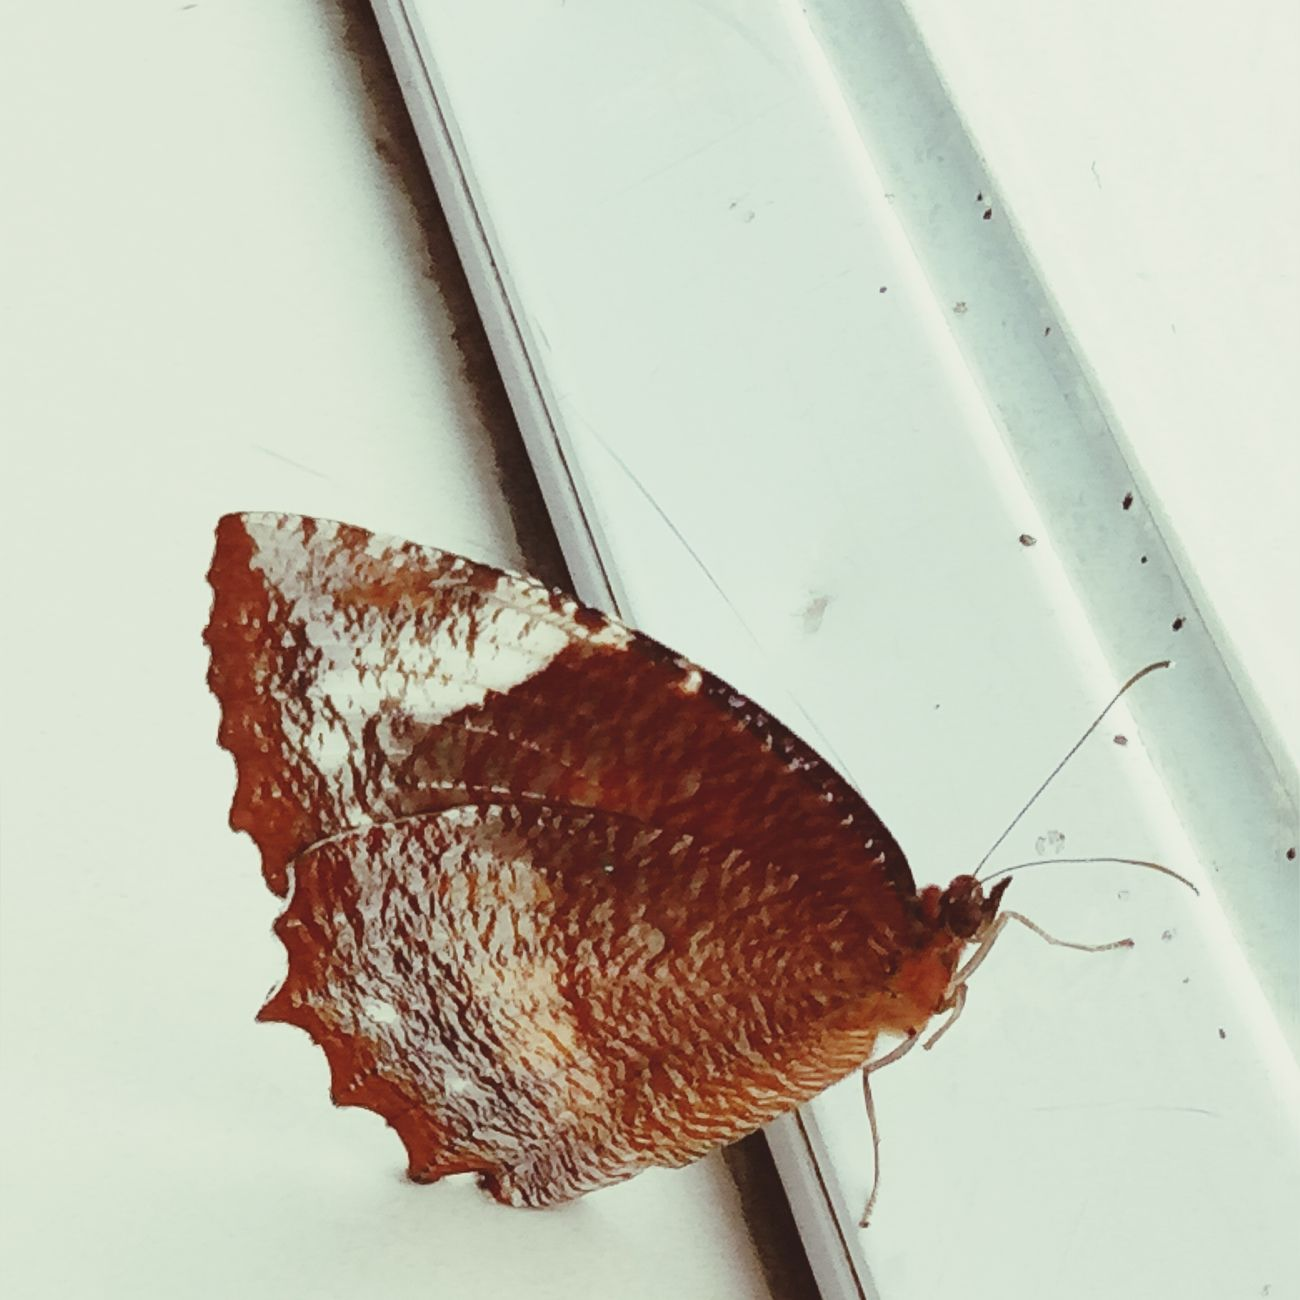 Butterfly Butterfly ❤ No People TheWeekOnEyeEM The Week On Eyem EyeEm Team EyeEmBestPics MyEyeEm Nature Nature Photography